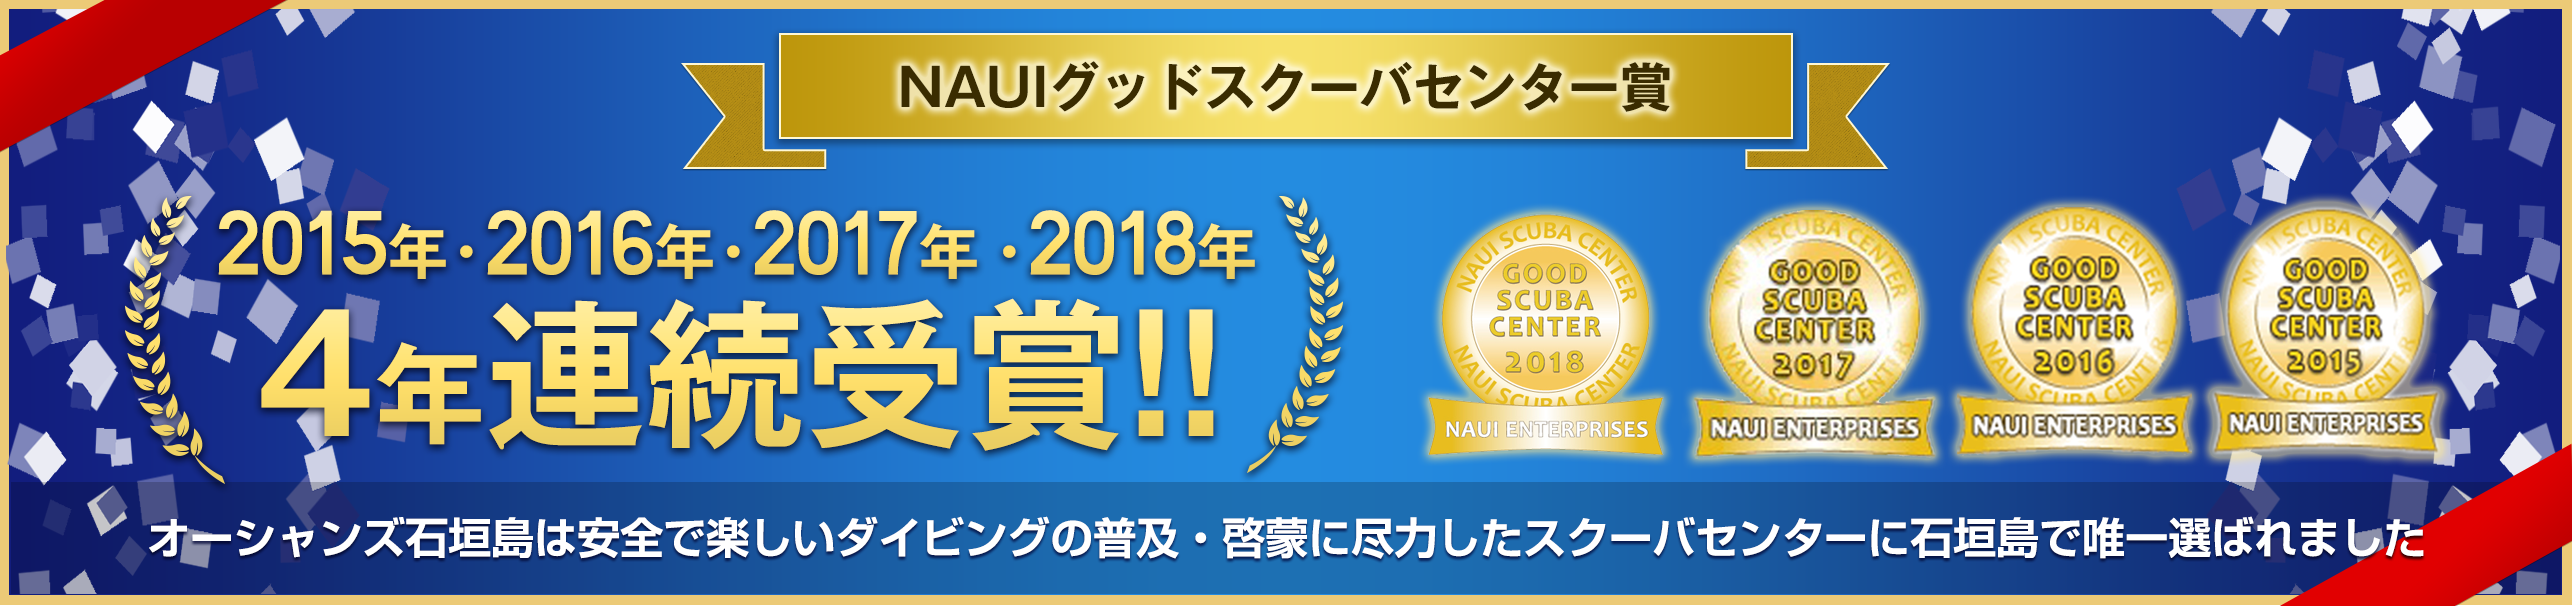 NAUIグッドスクーバセンター賞 2018&2017&2016&2015受賞!!